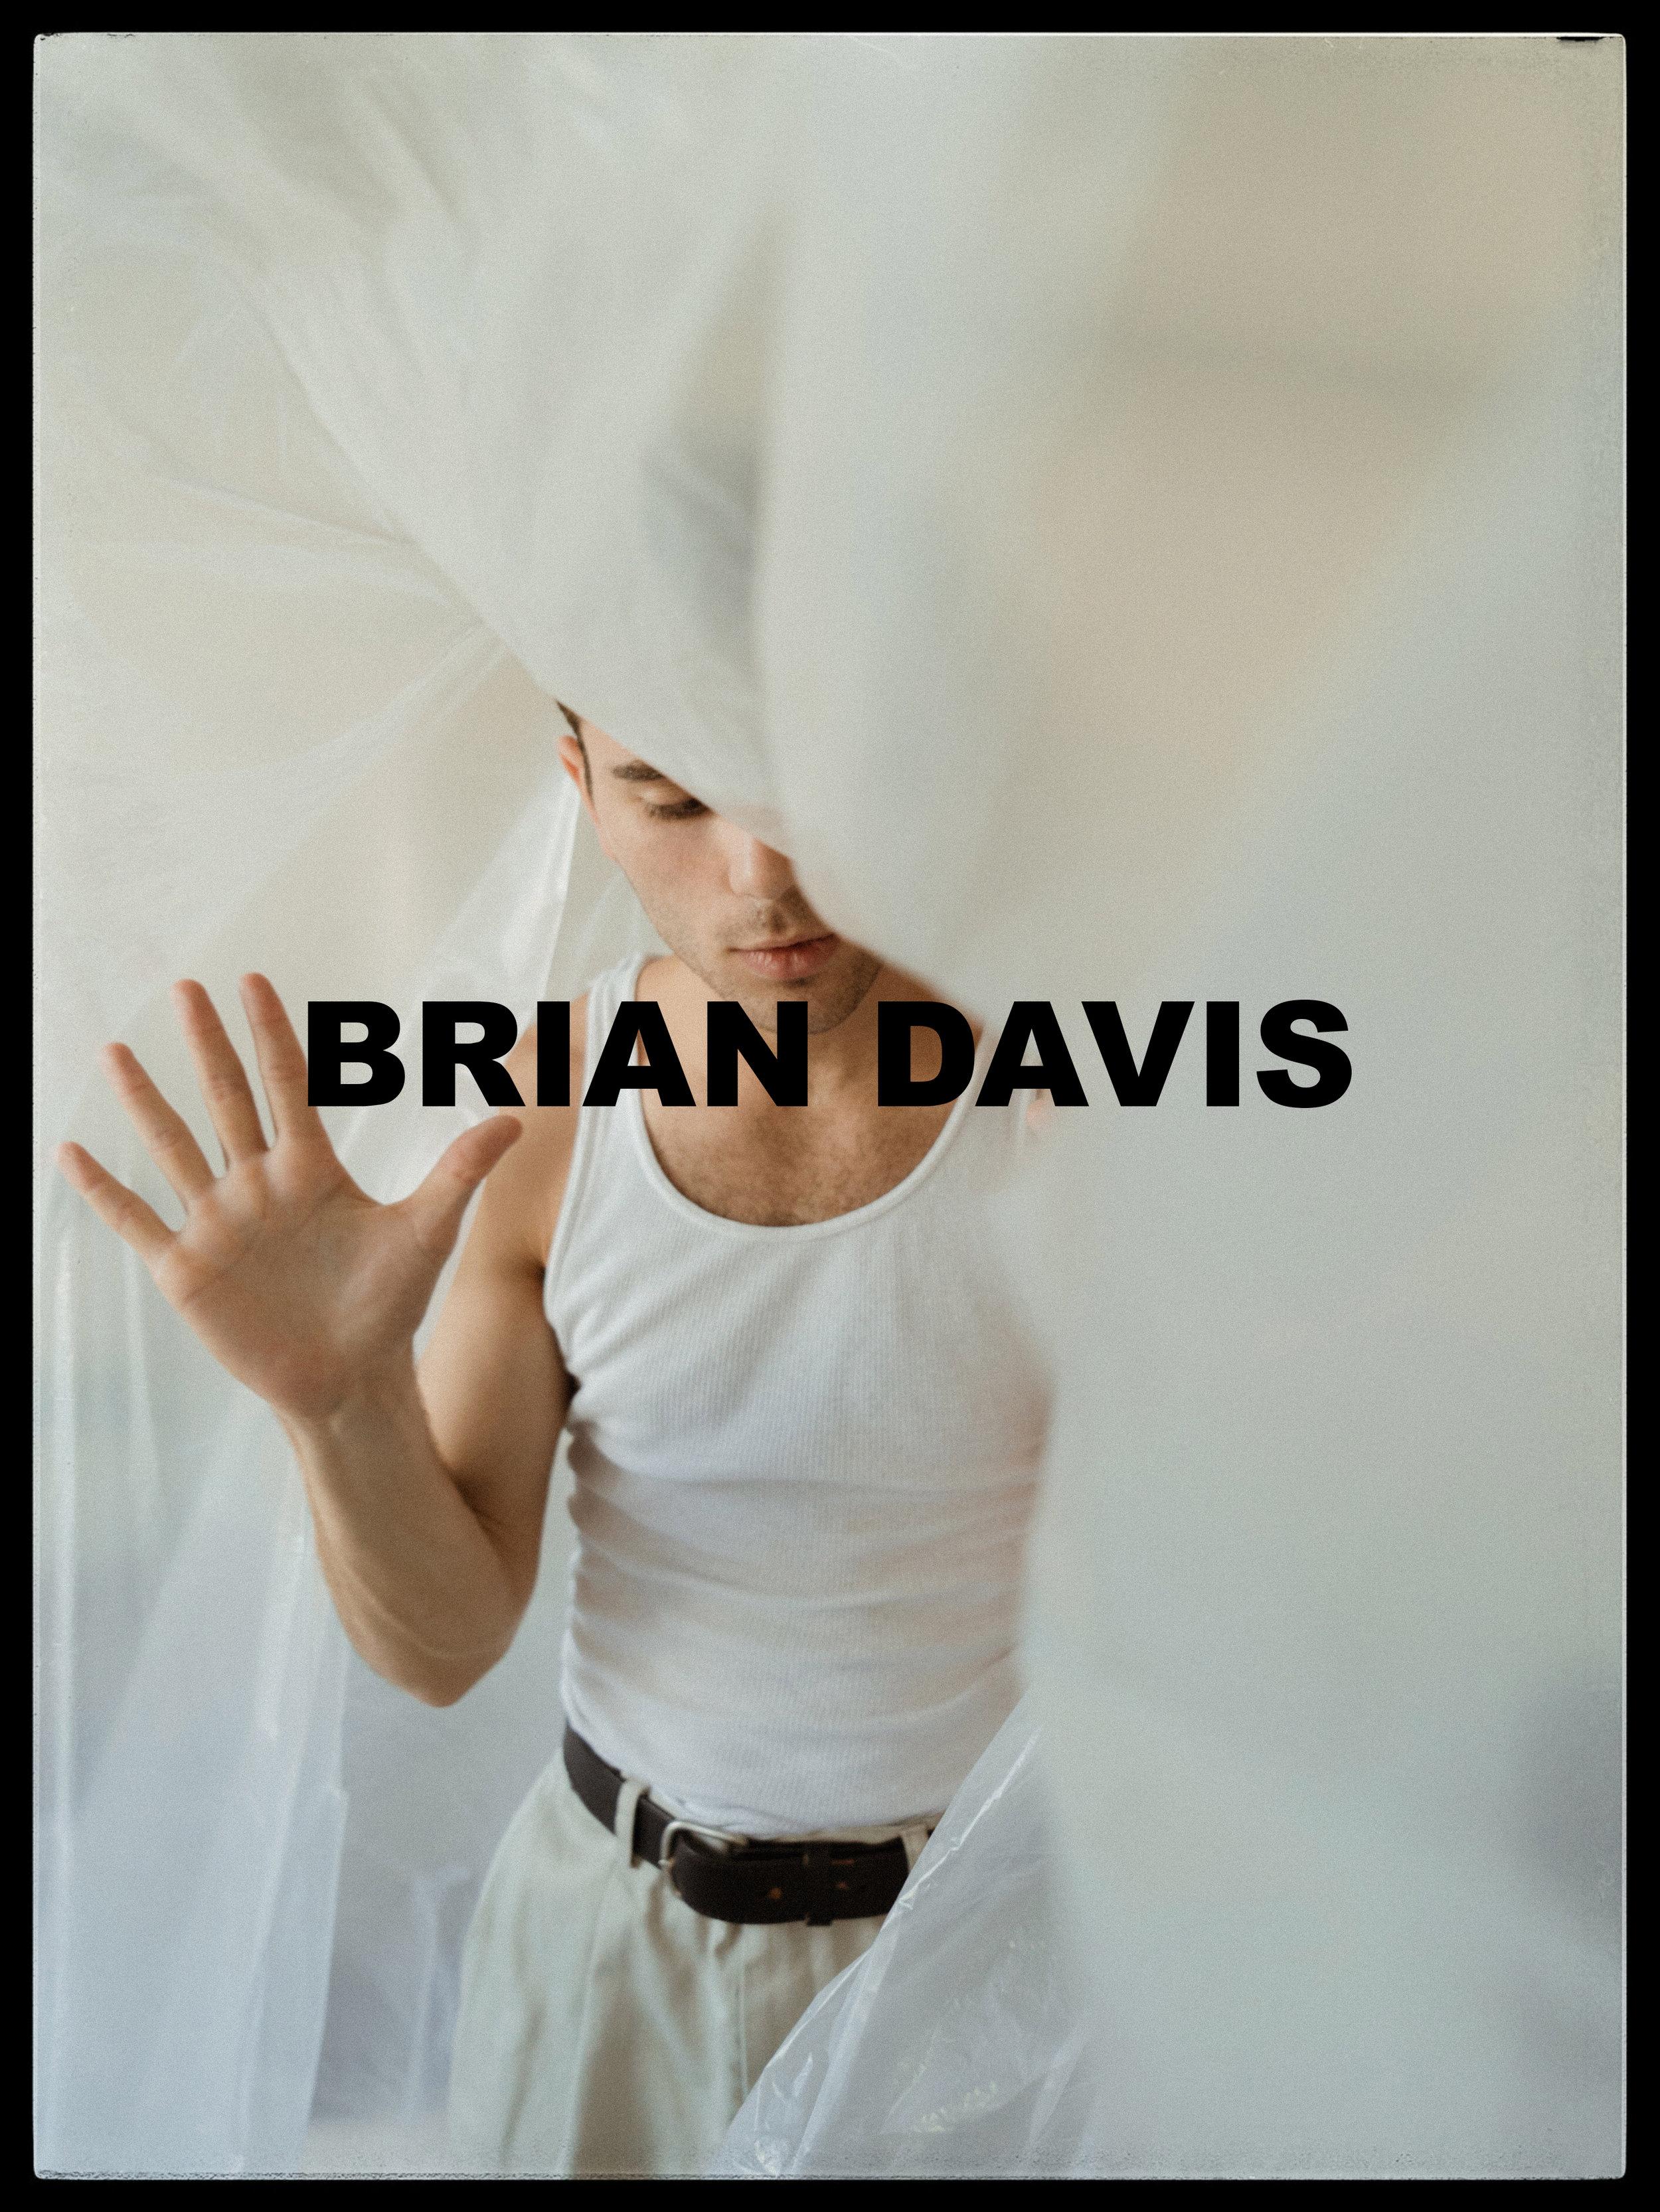 Brian_davis2.jpg